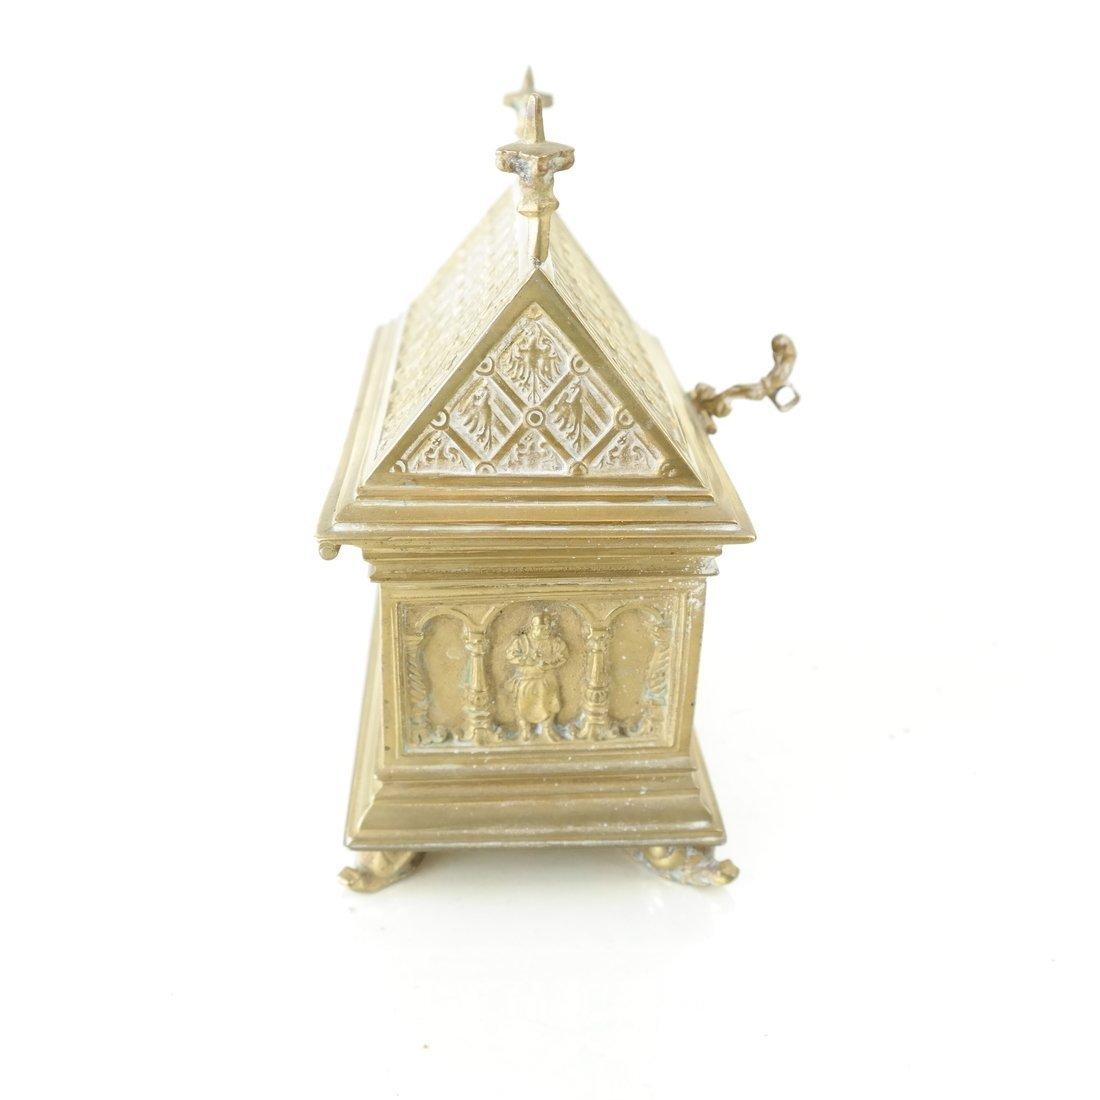 Ornate Casket Form Box - 4